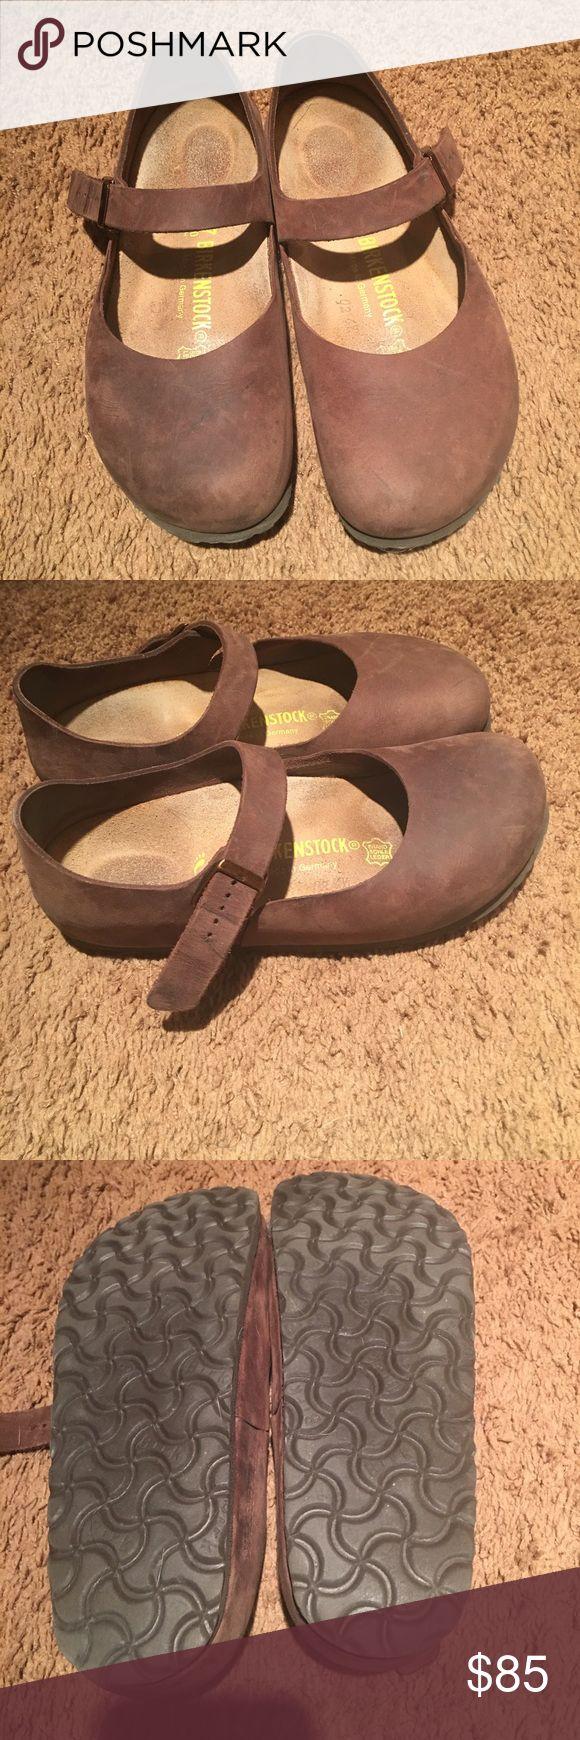 Women's birkenstocks Size 37 brown leather women's birkenstocks in amazing condition. So comfy, just don't wear. Birkenstock Shoes Mules & Clogs